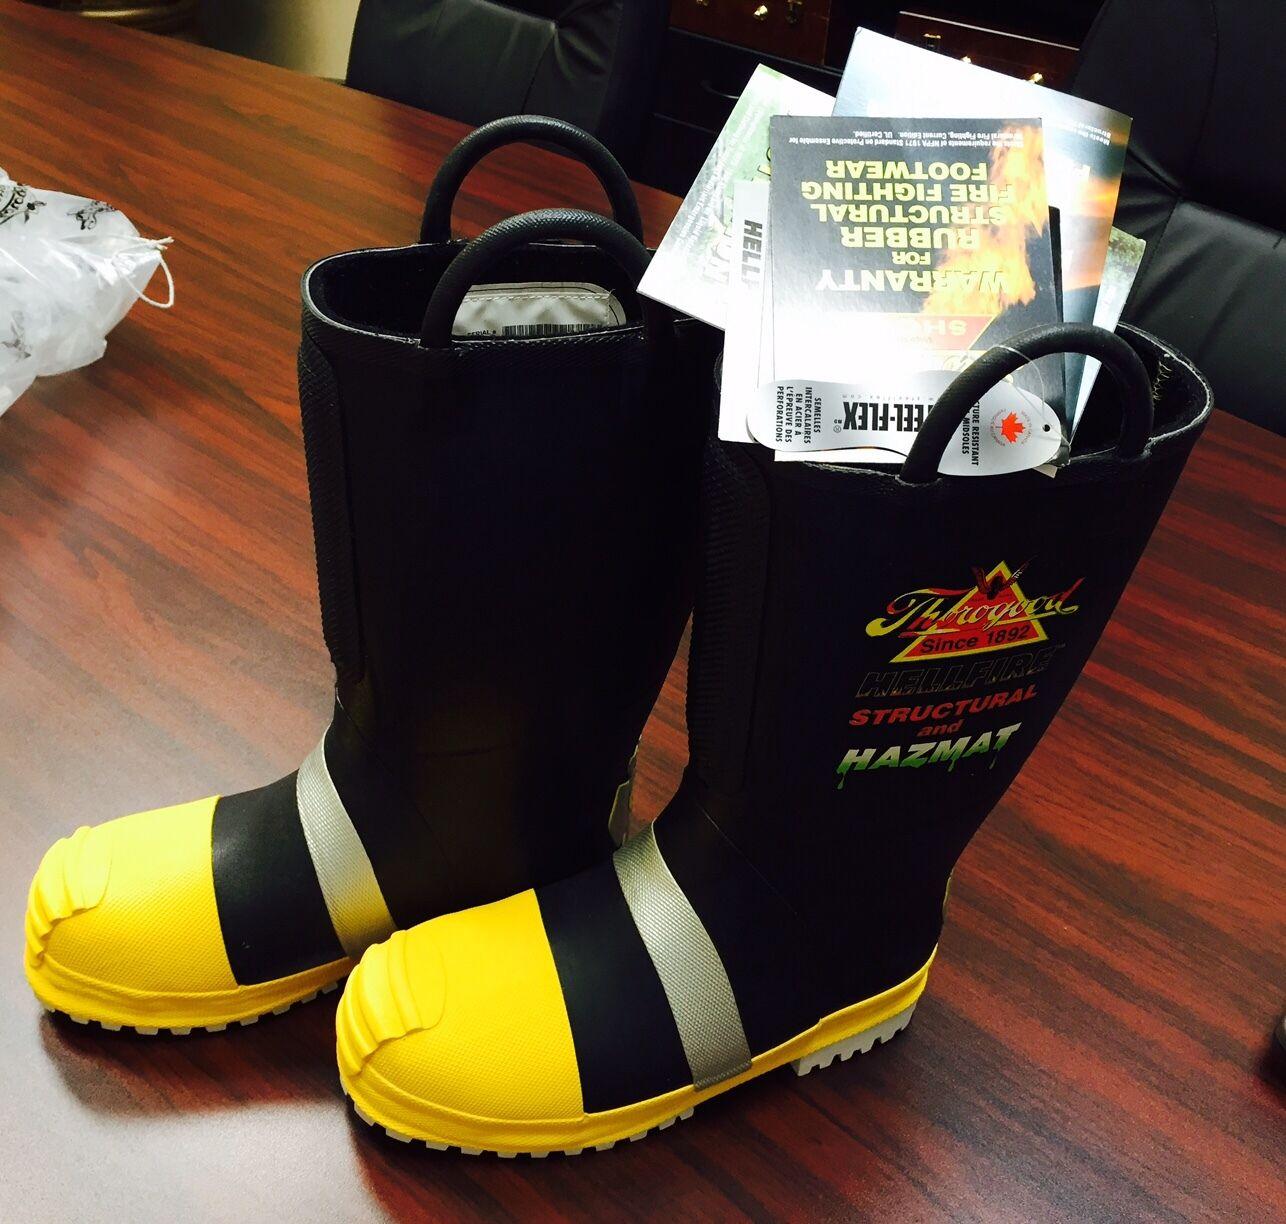 THgoldGOOD SHOES 807-6003 Ins Fire Boots, Mens 1PR SIZE 7